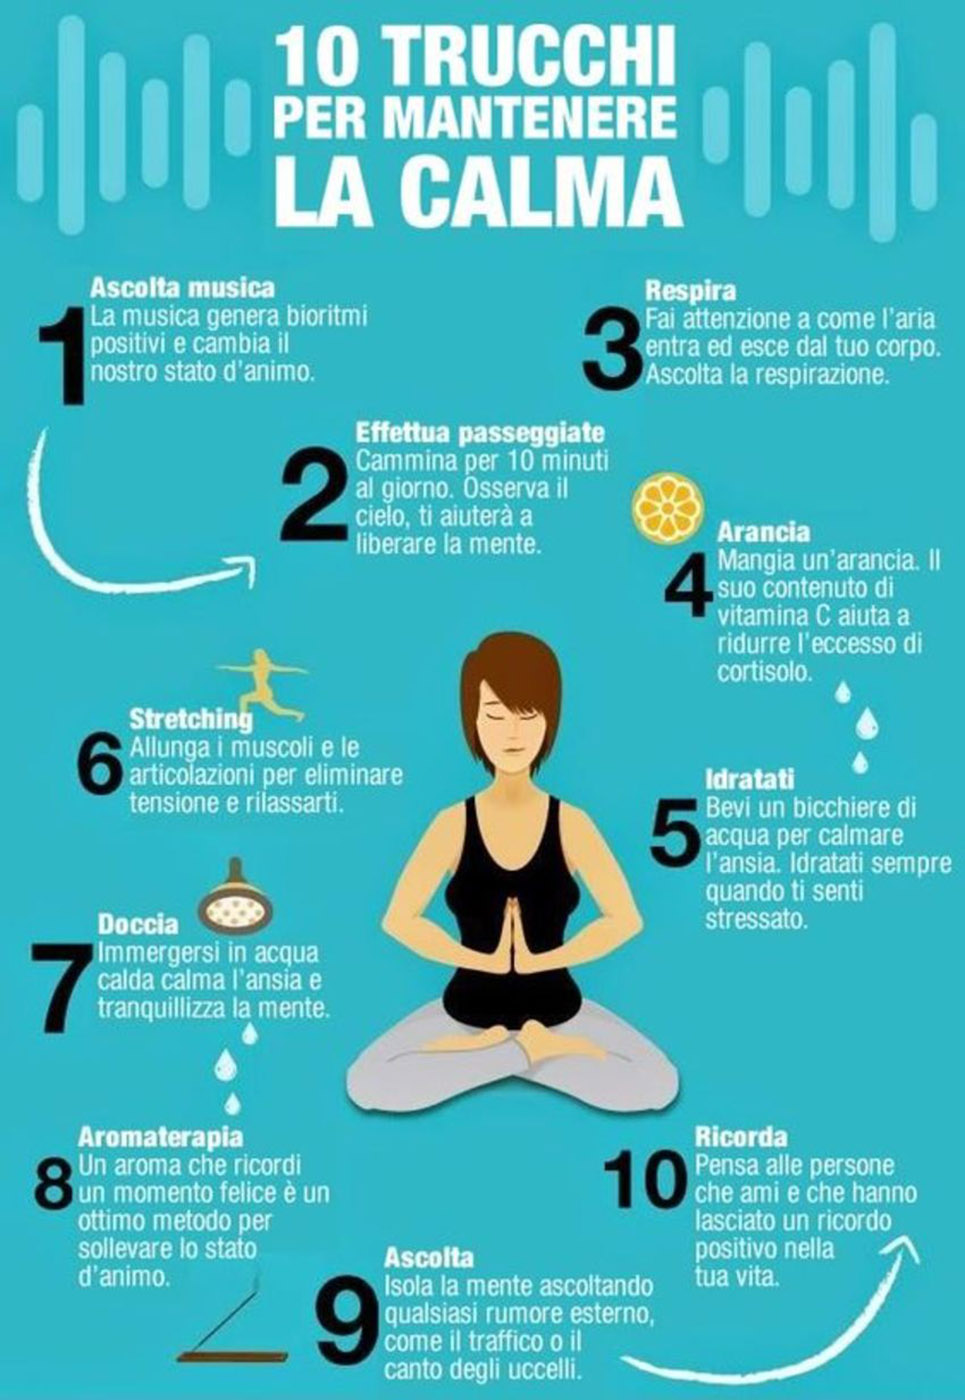 10 trucchi per mantenere la calma